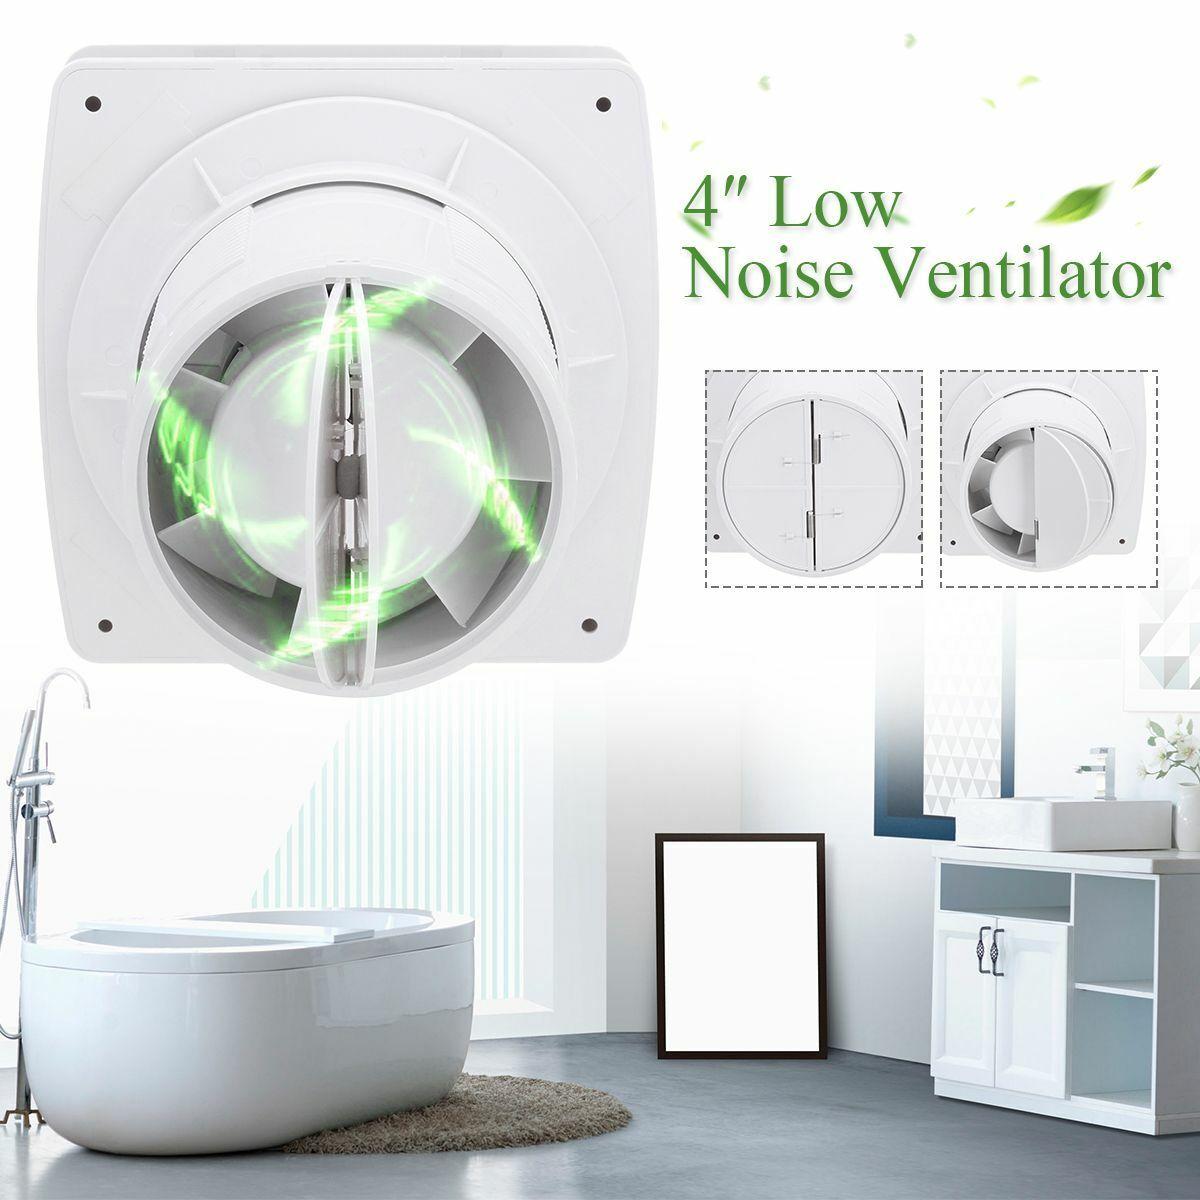 Home Bathroom Kitchen Toilet Low Noise 220V Ventilator Wall